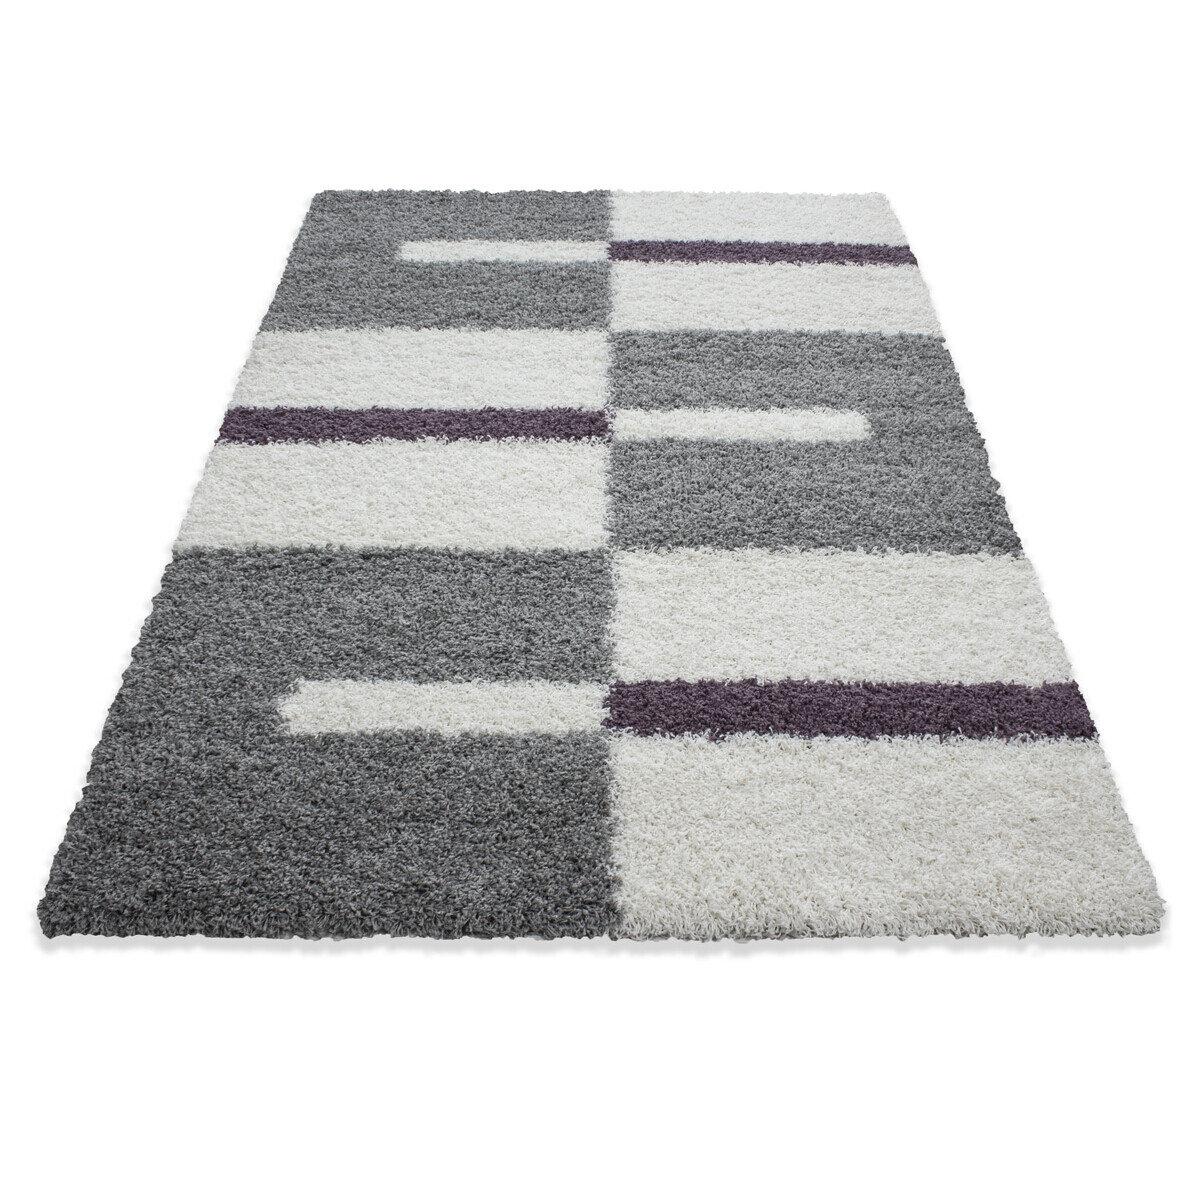 Covor Decorino Kenya, modern & geometric,shaggy, polipropilena, C04-203505, 80 x 150 cm, Alb